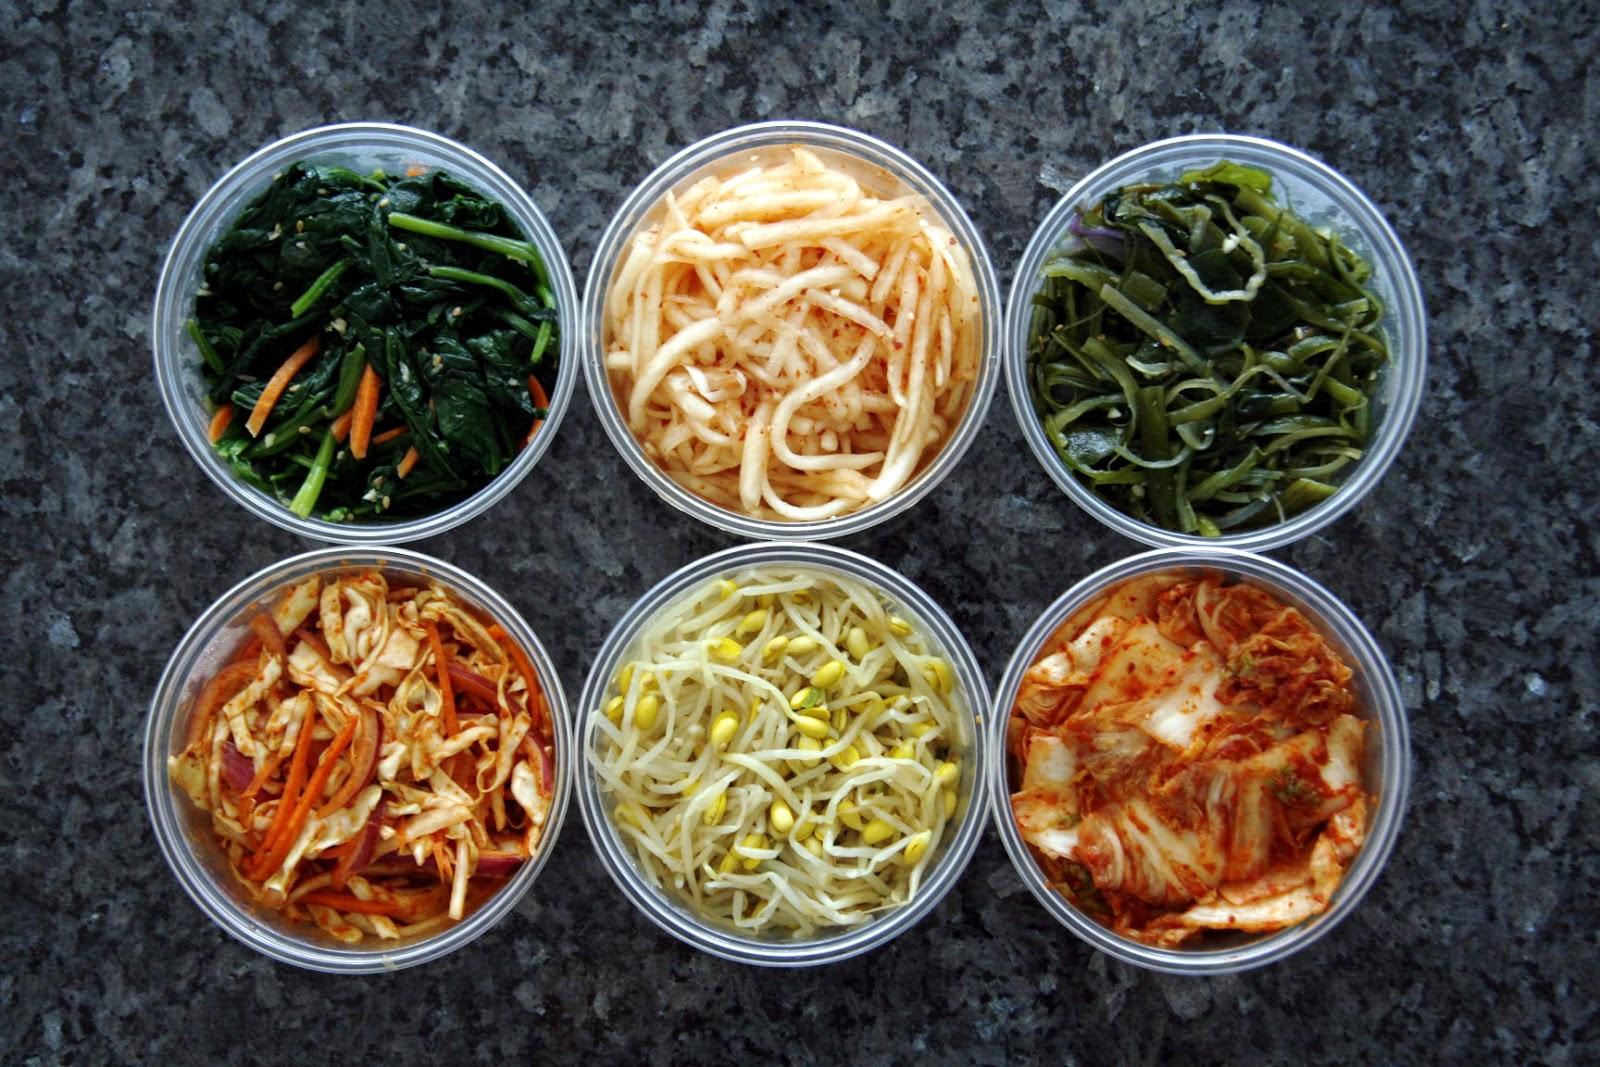 Korean Food Delivery In Toronto